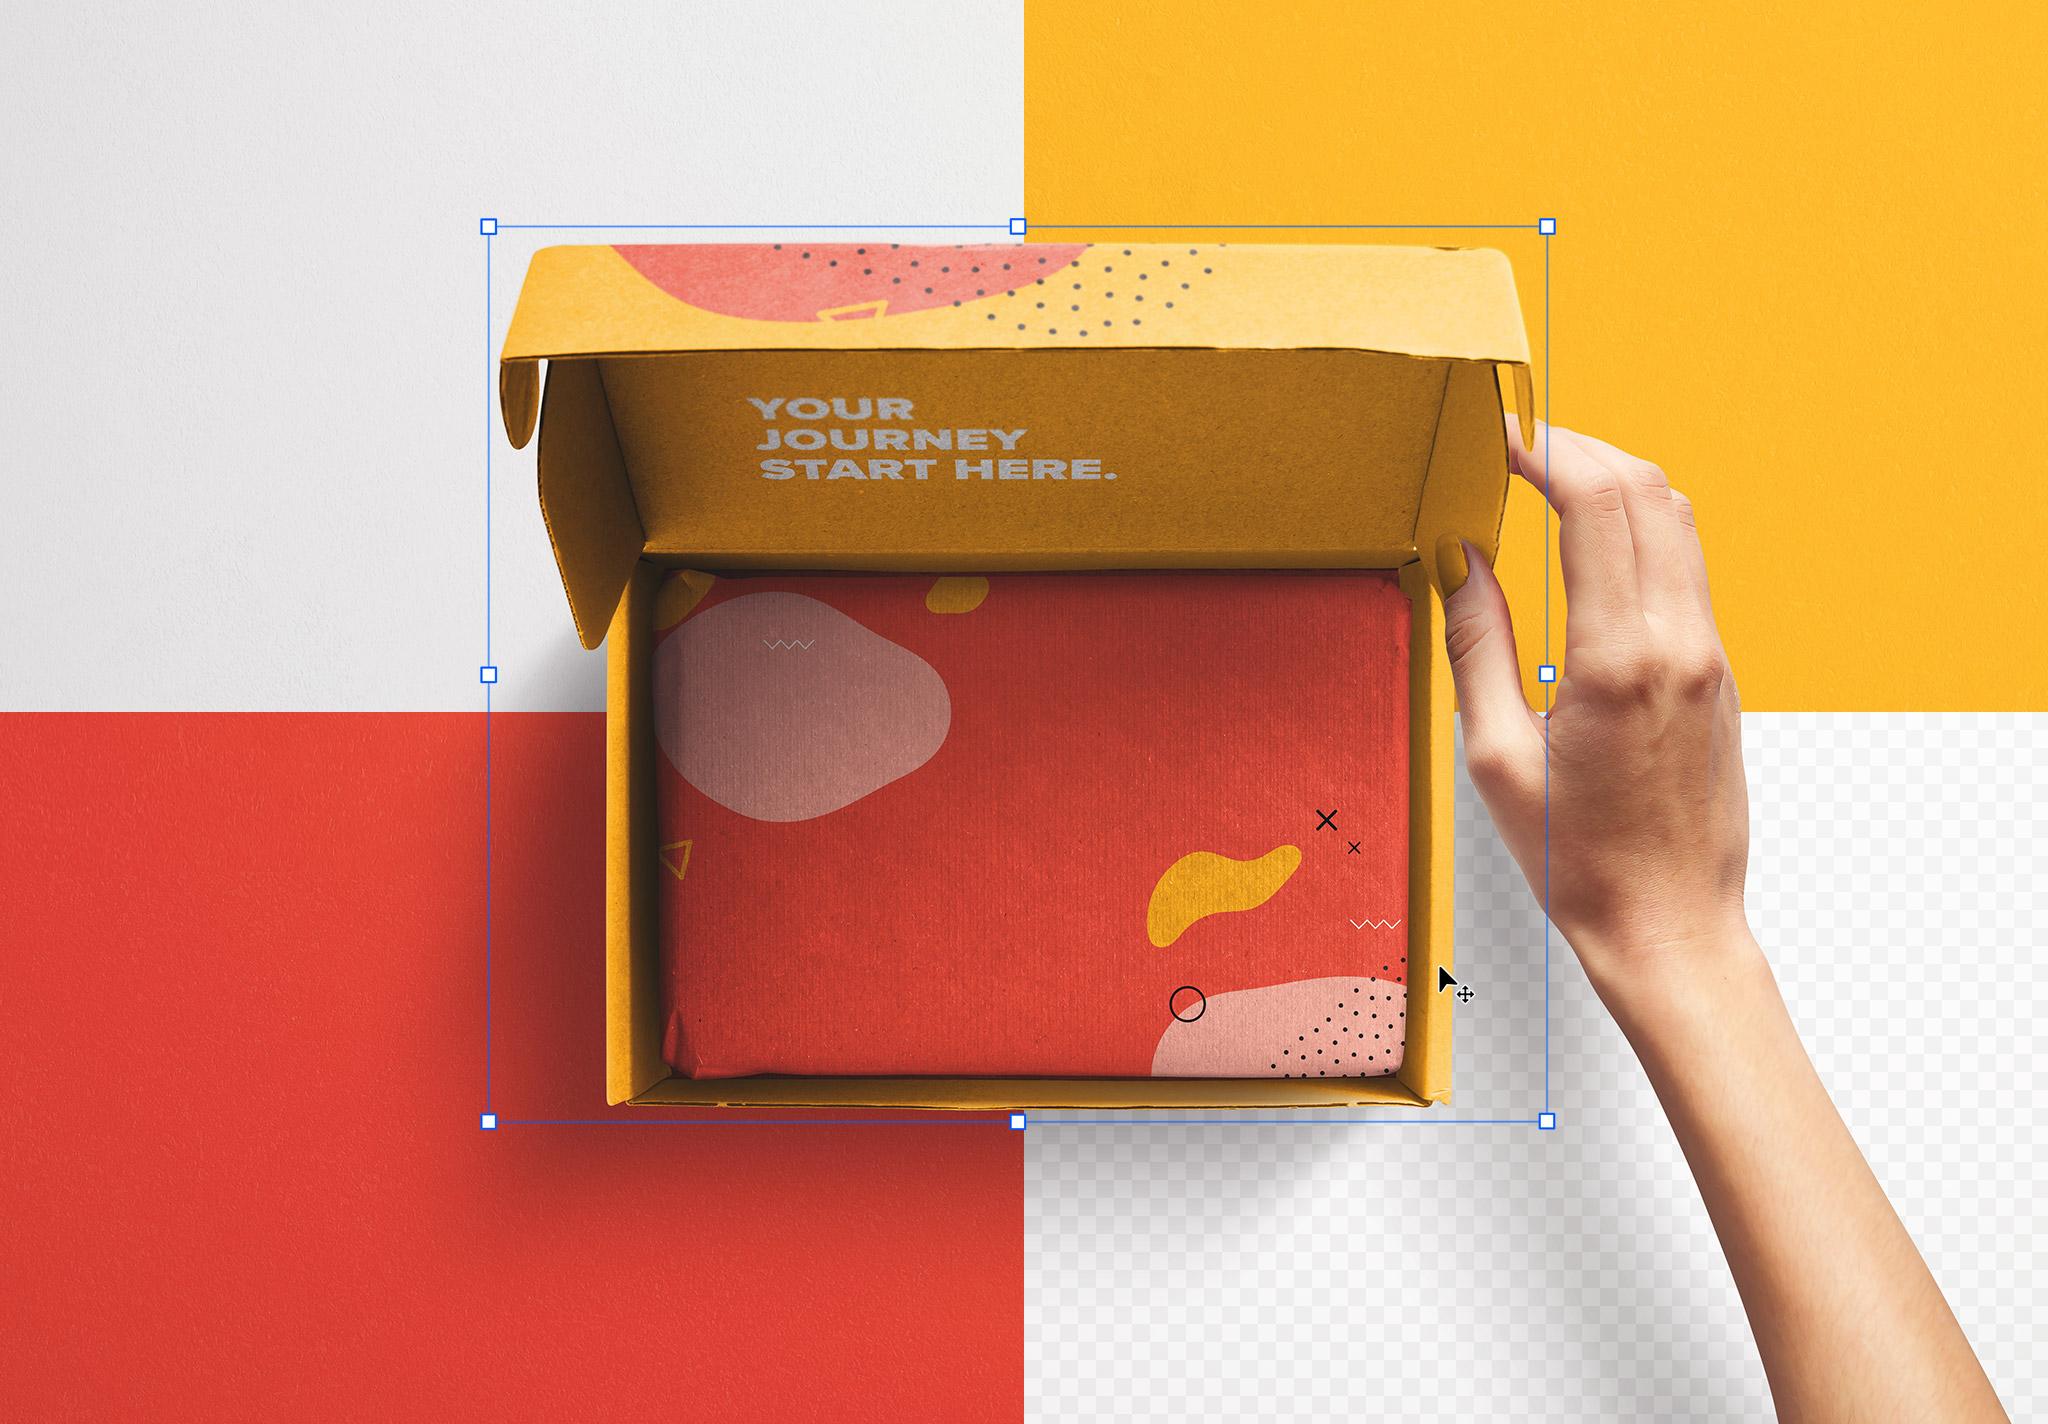 Hand Holding Opened Postal Box Lid Mockup image02